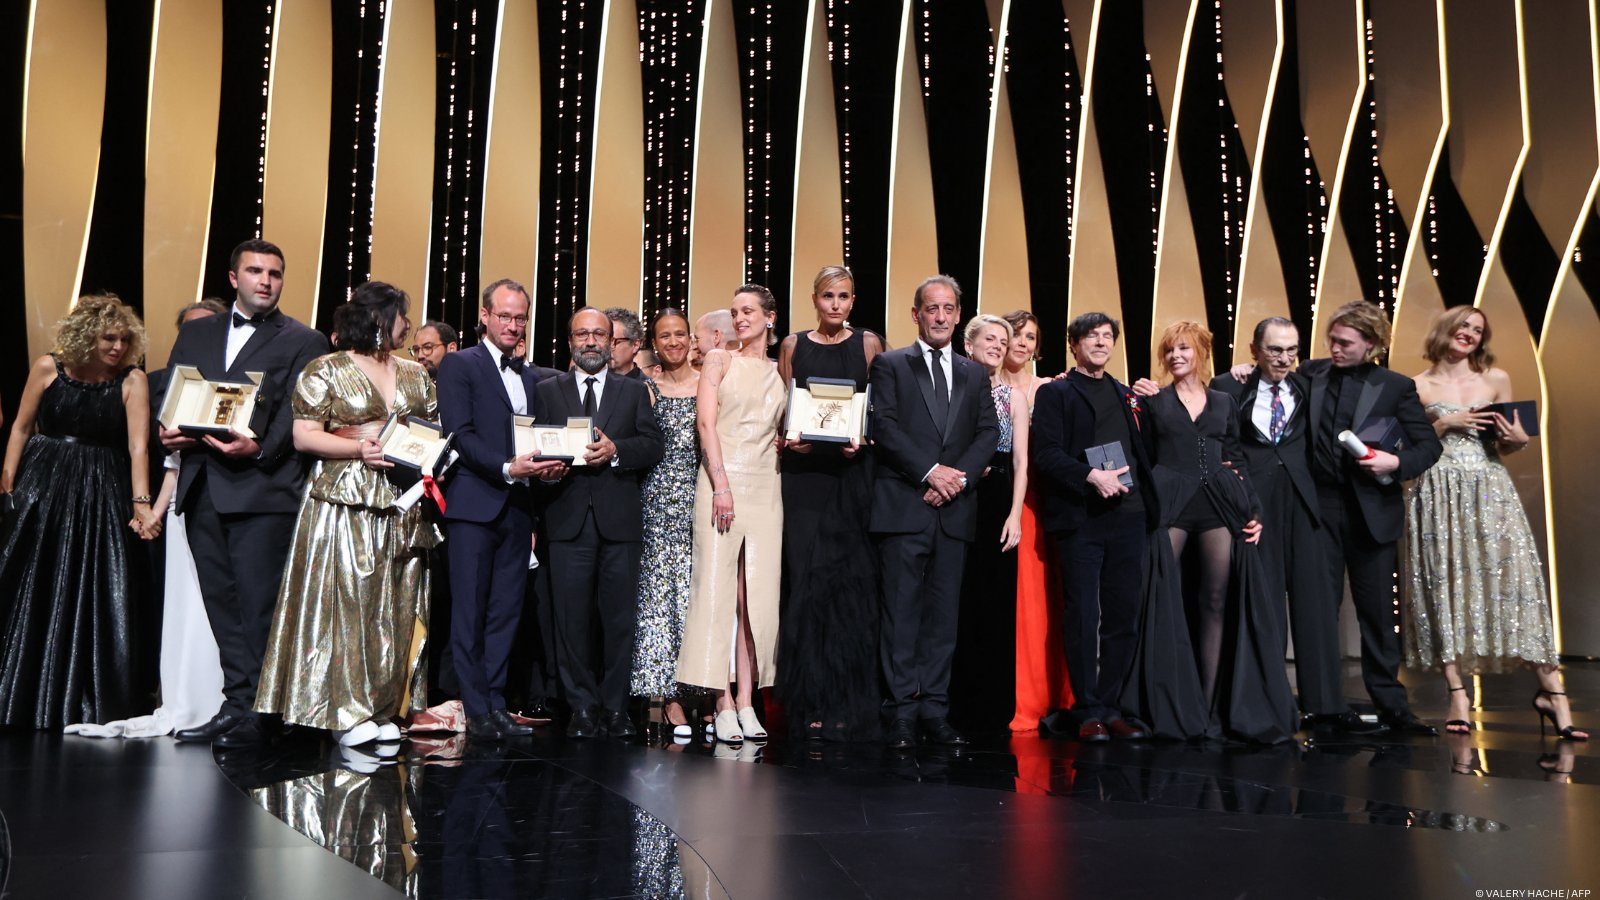 Festival di Cannes 2021 vincitori: Titane Julia Ducournau vince Palma d'oro